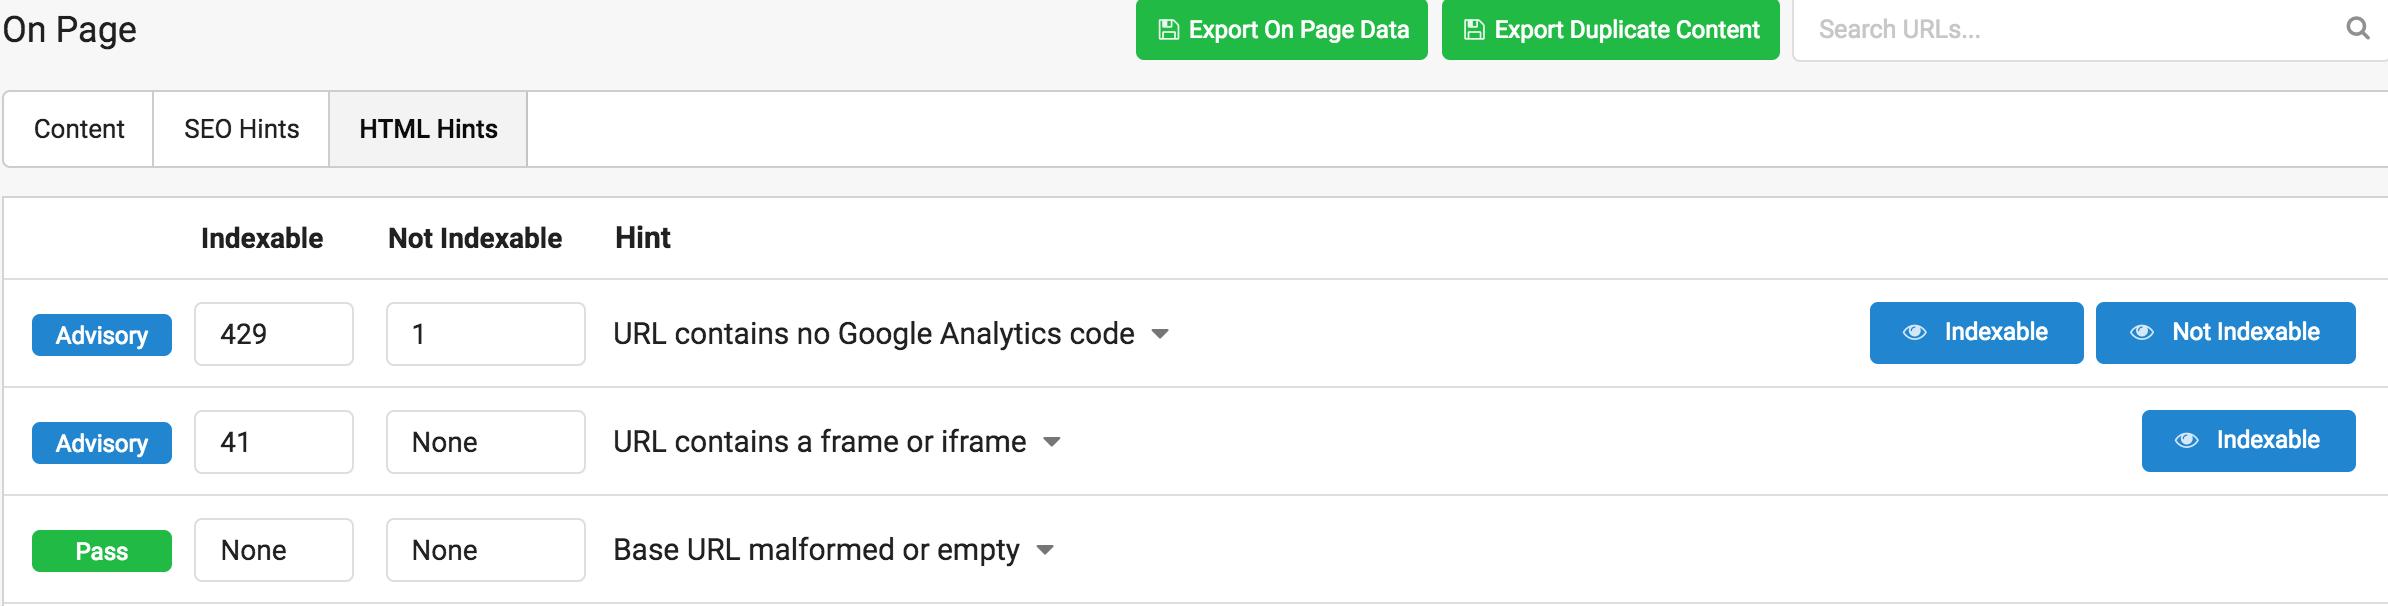 html hints sitebulbs